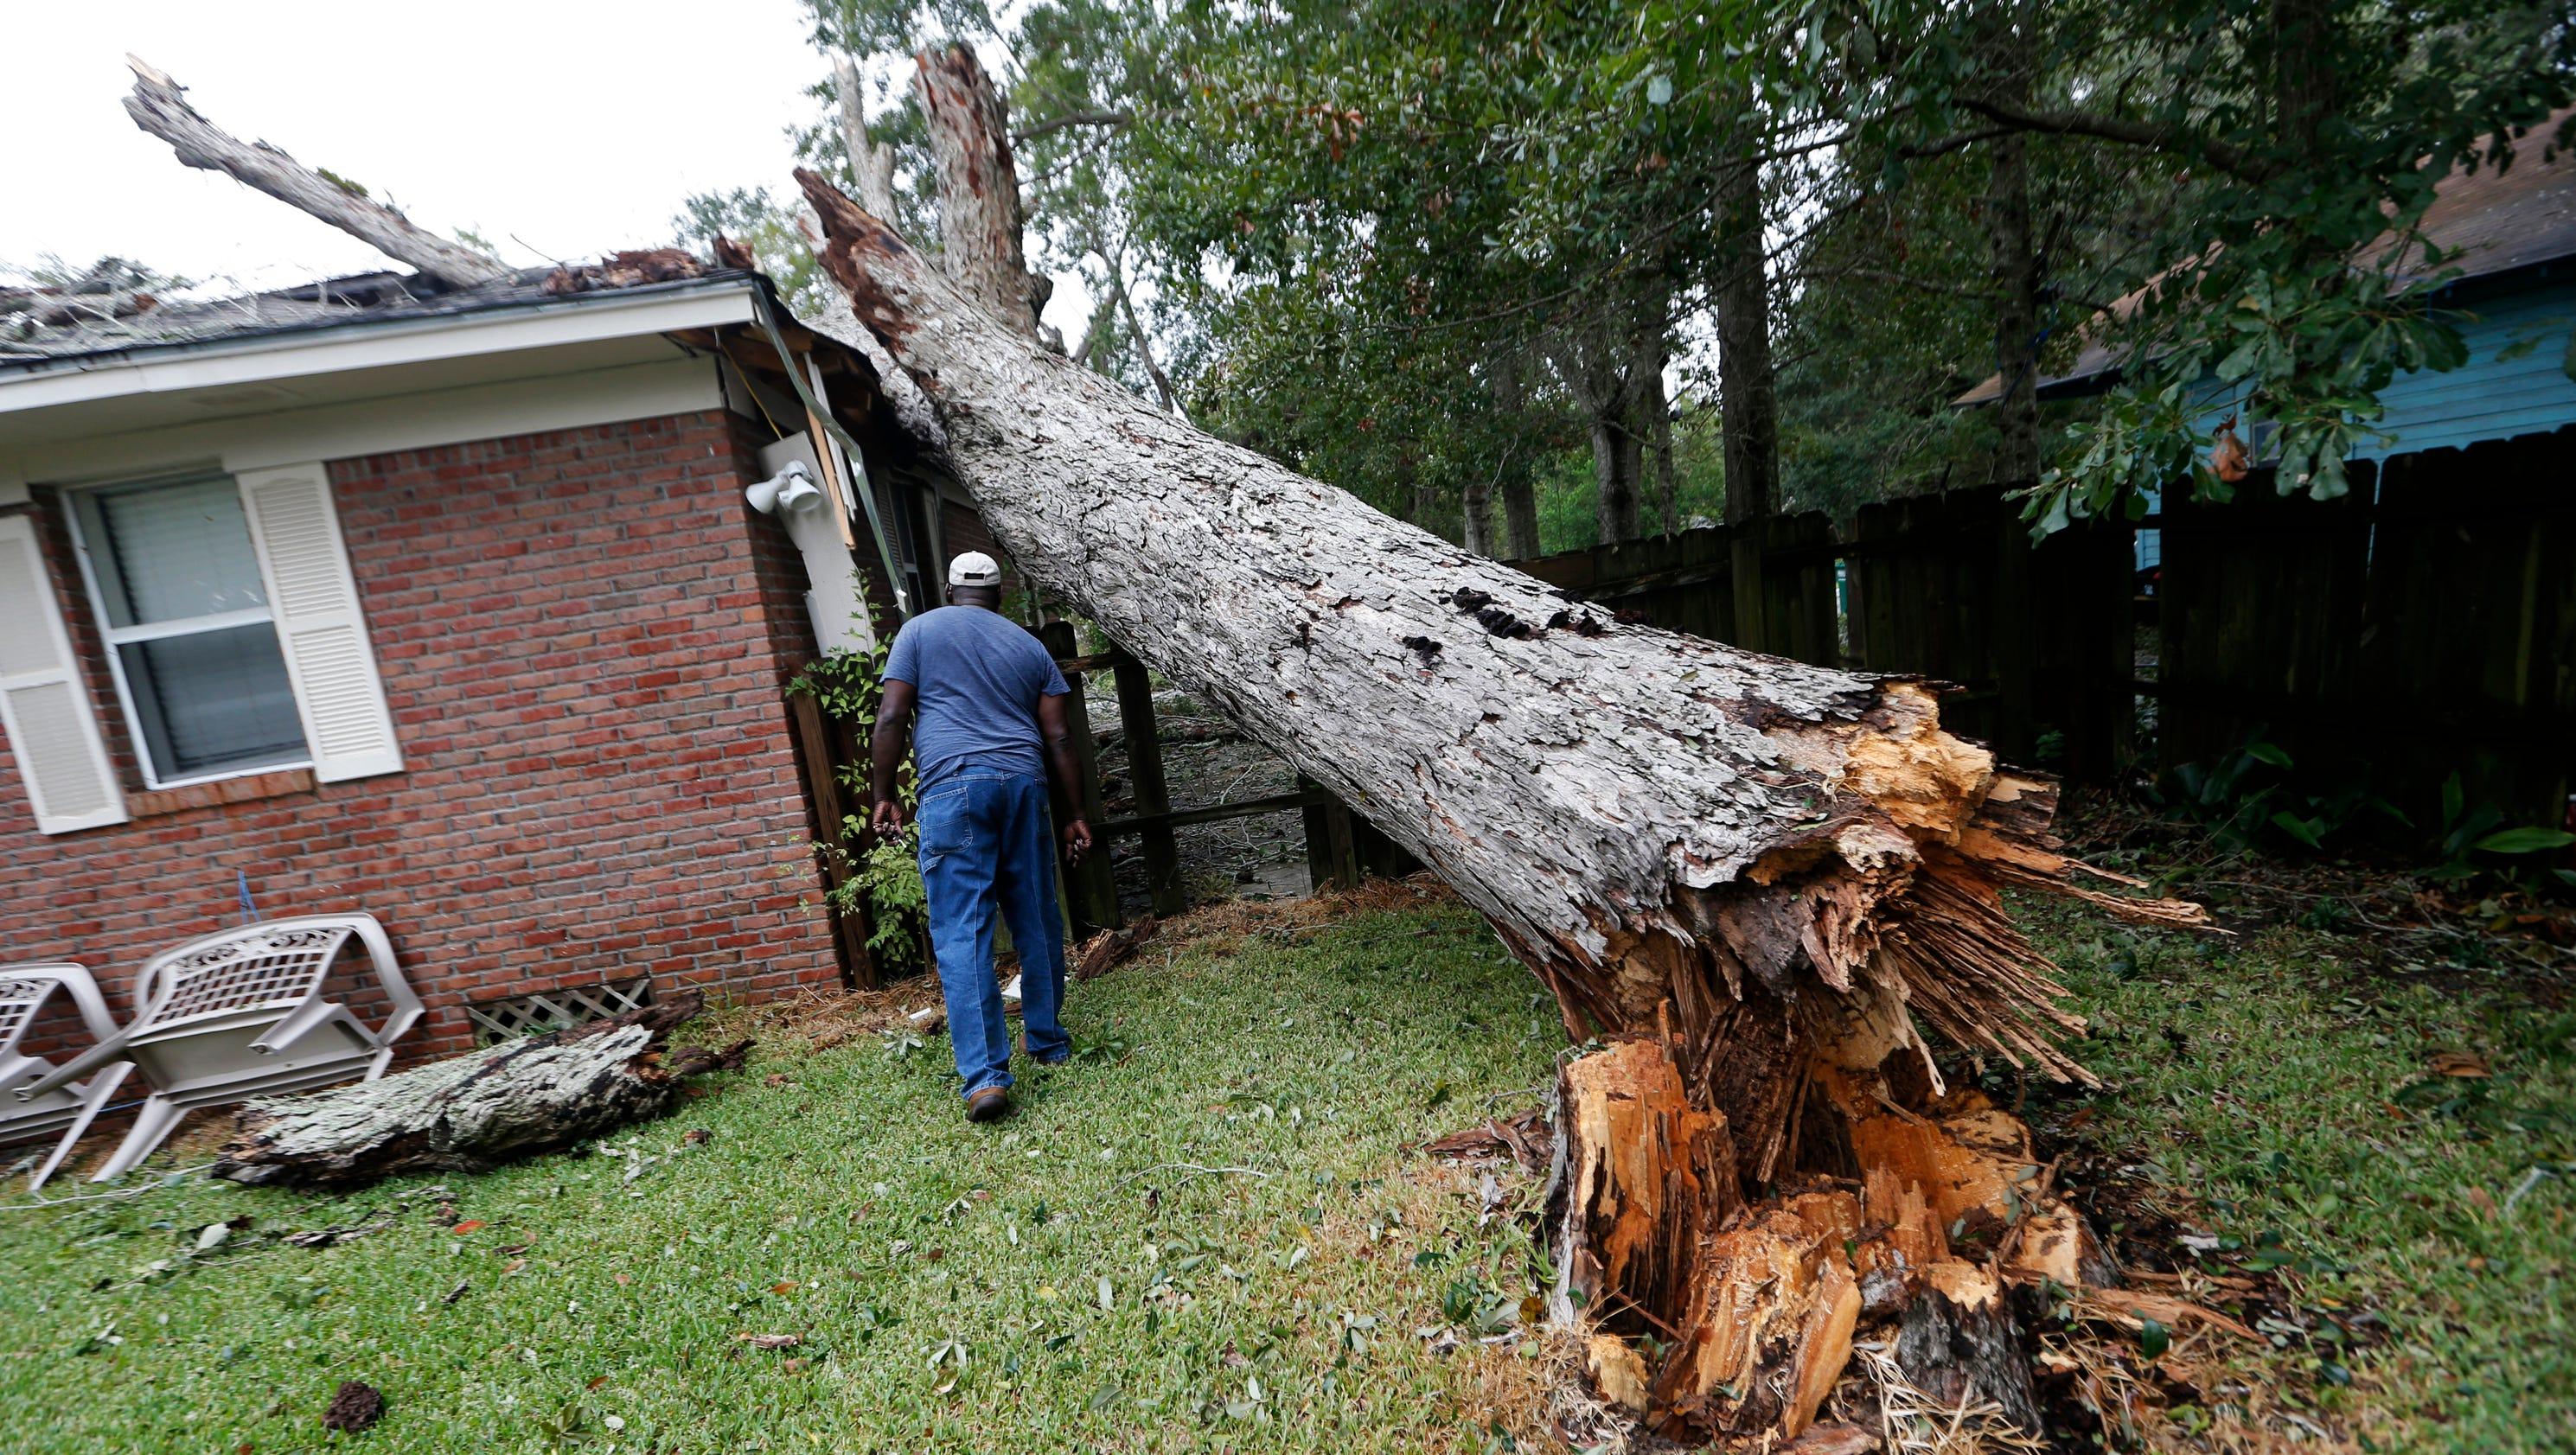 Hurricane Nate Hits Gulf Coast With Heavy Rains And Winds